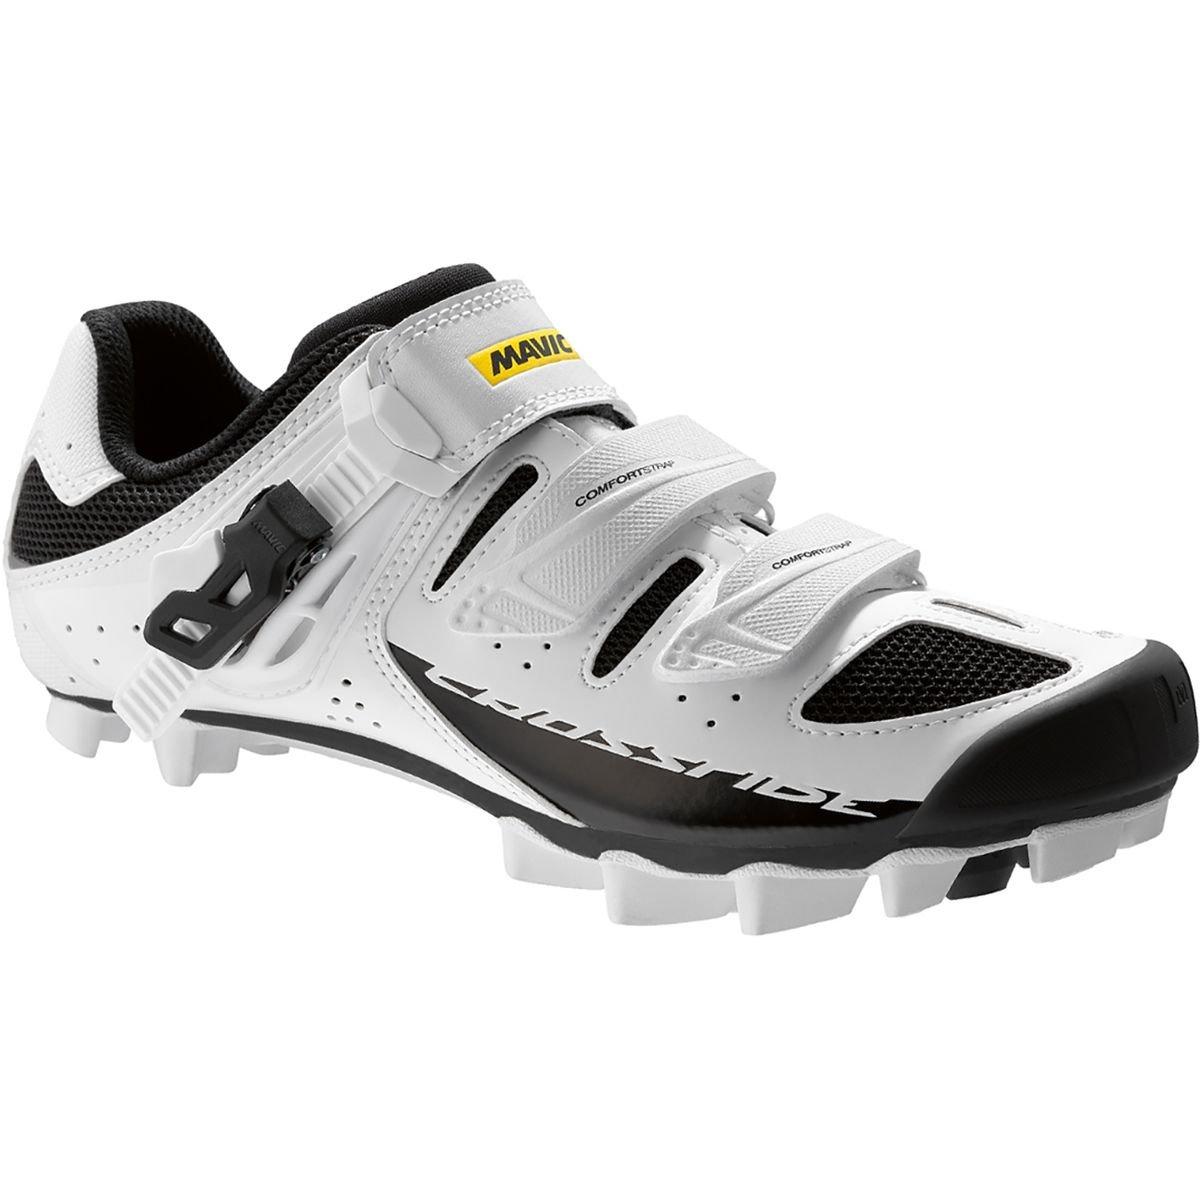 Mavic Crossride SL Elite Cycling Shoes - Women's White/Black/White, US 7.5/UK 6.0